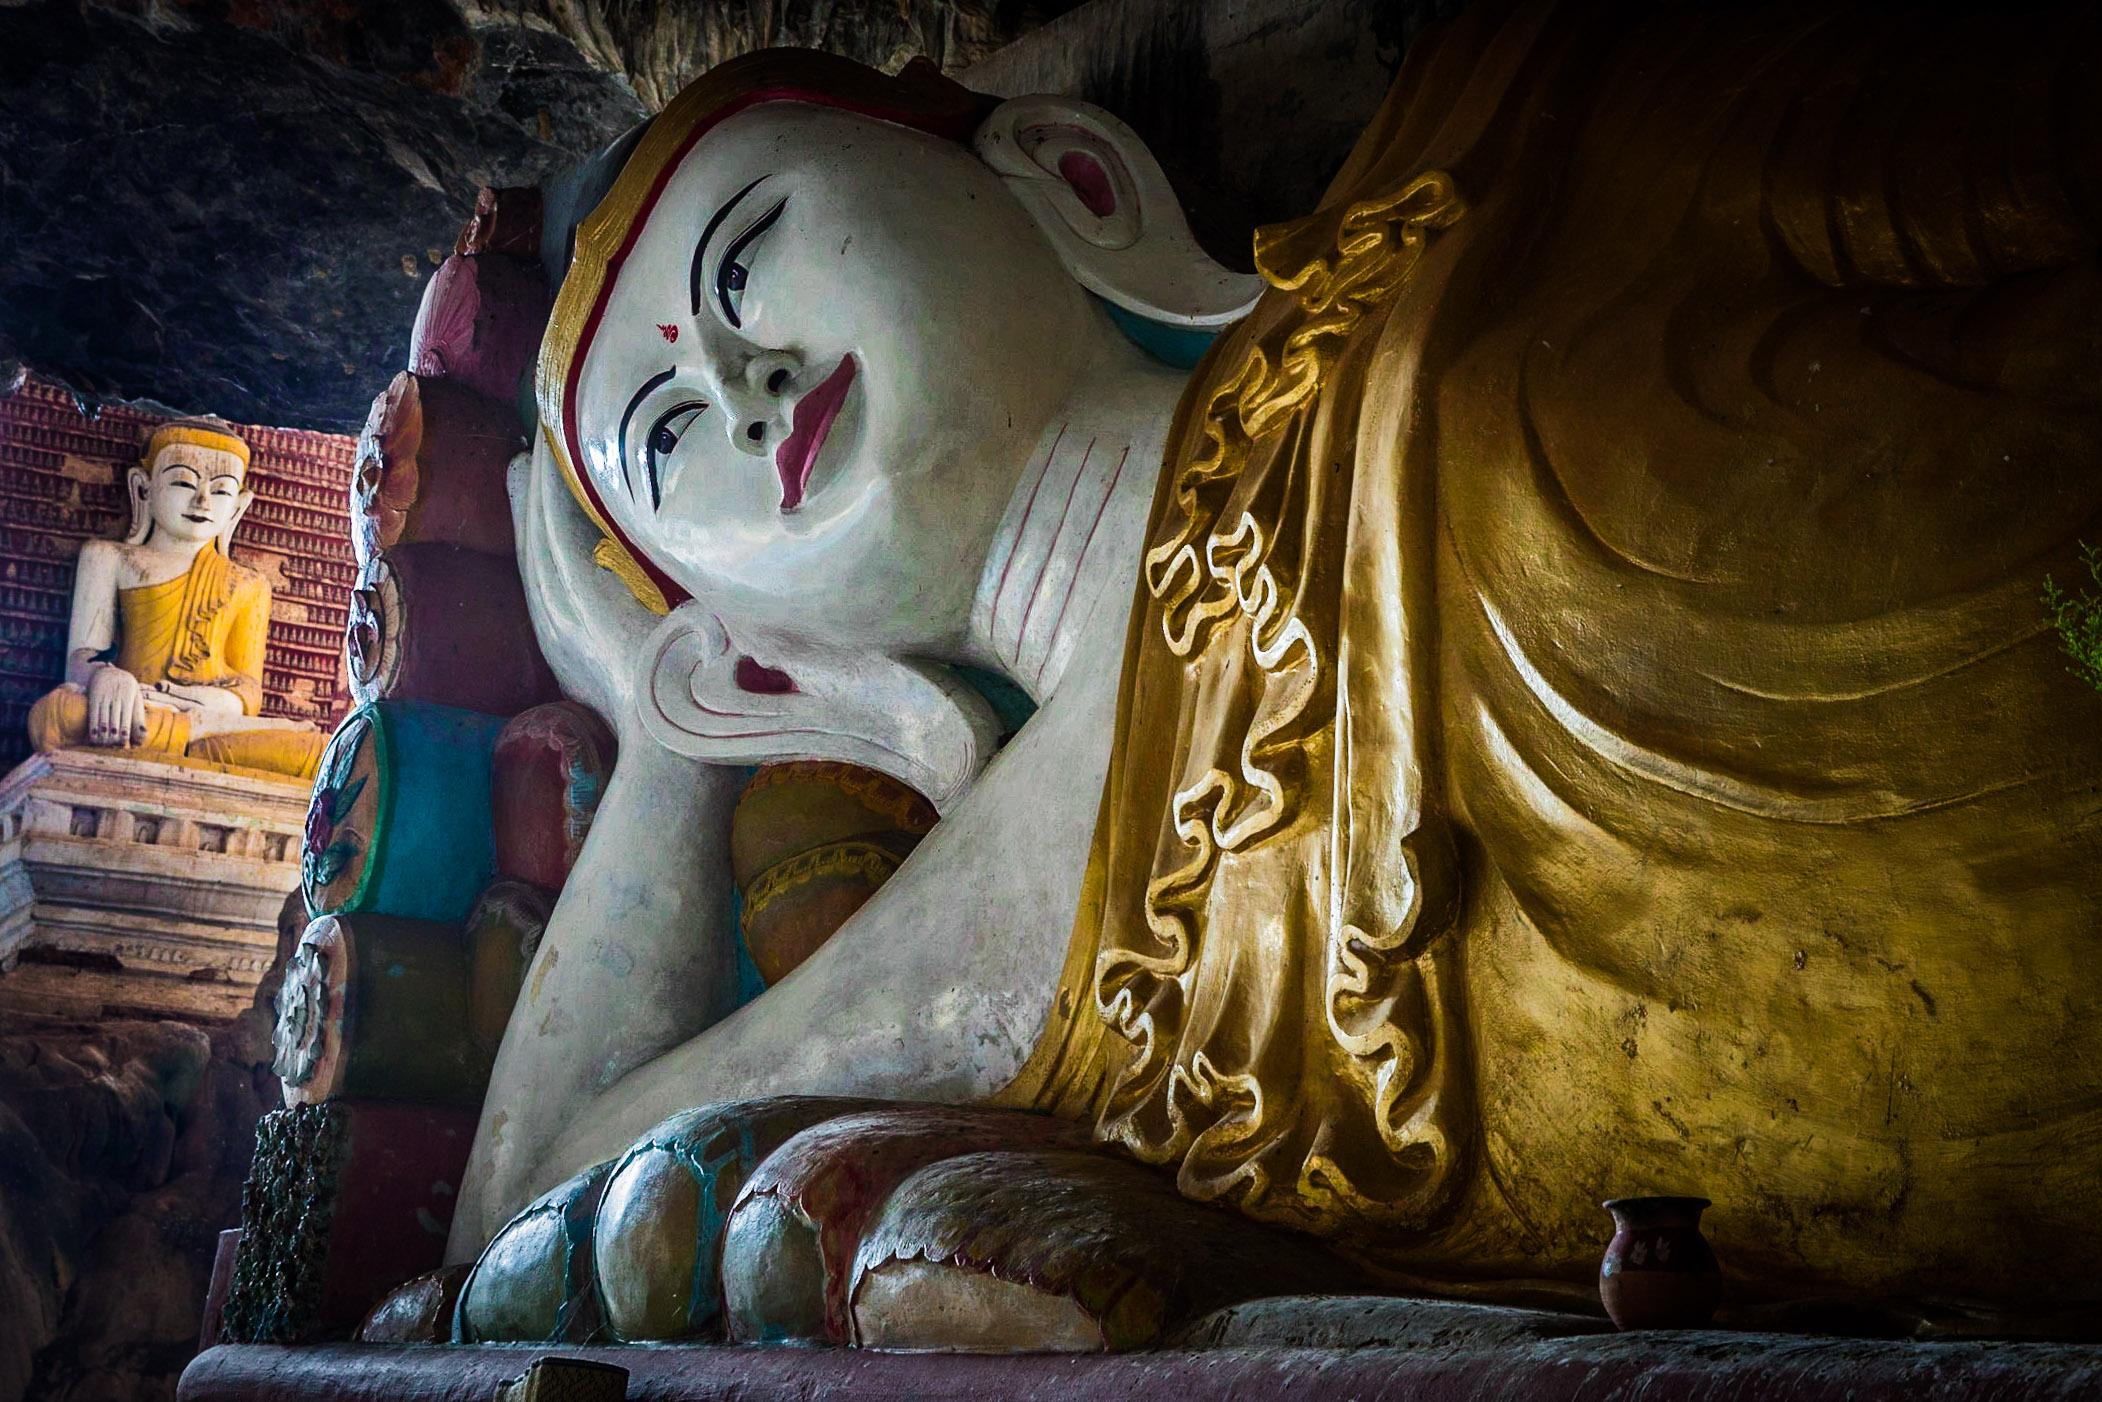 Kaw Gon Cave Buddha statues